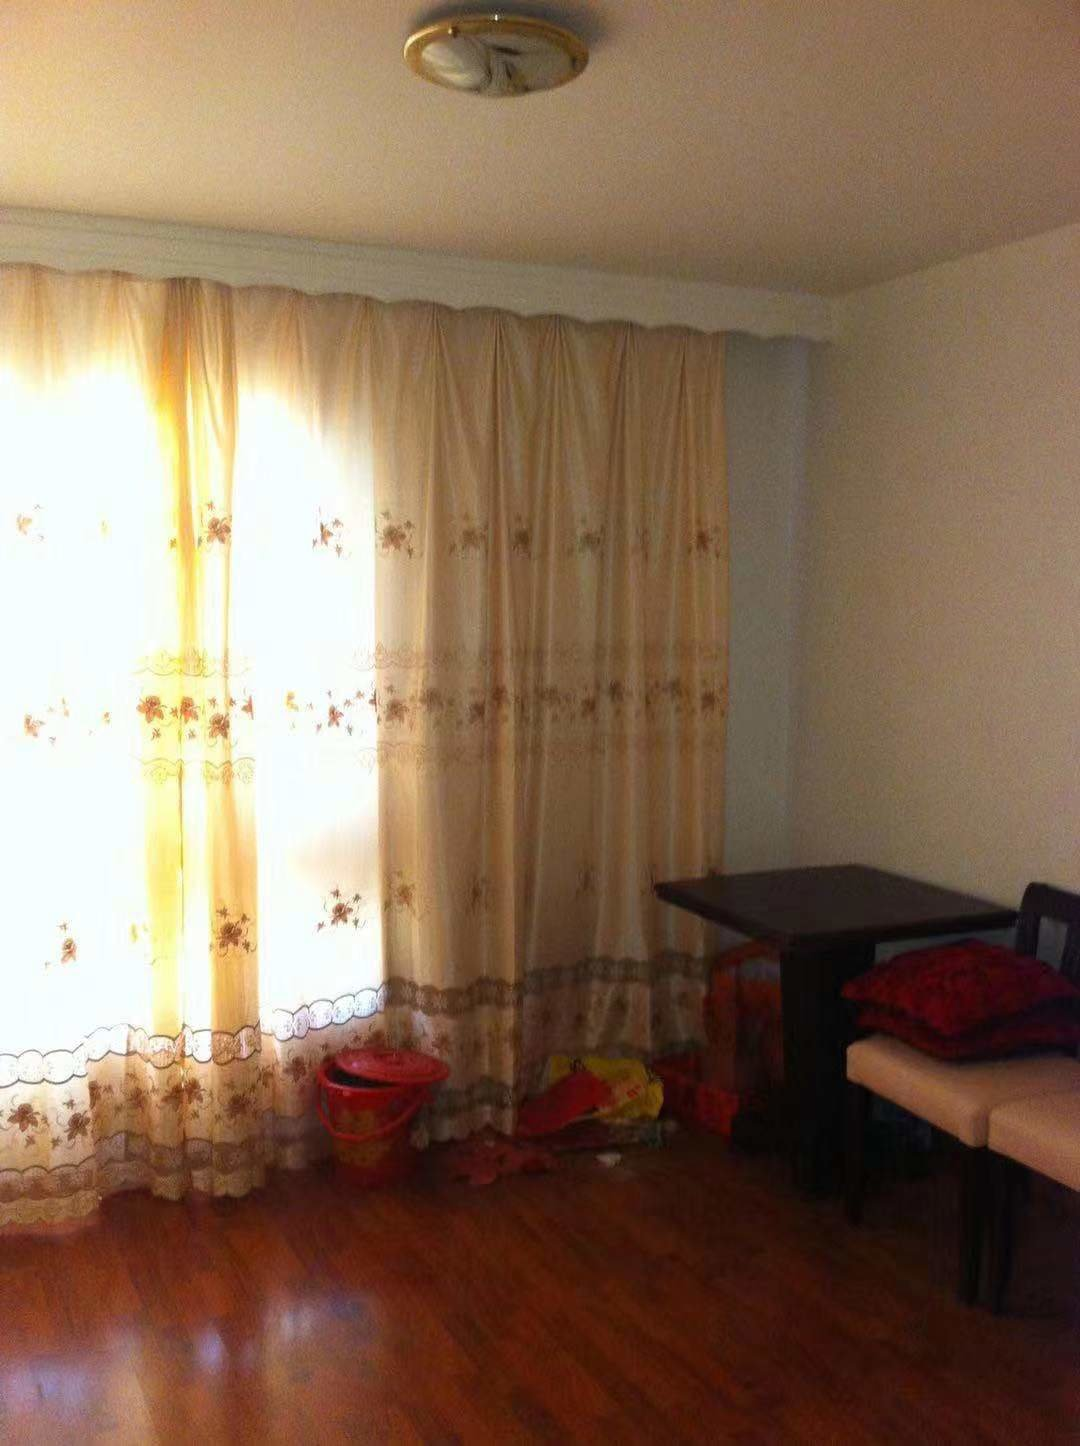 出售 公寓 - Bagnolet